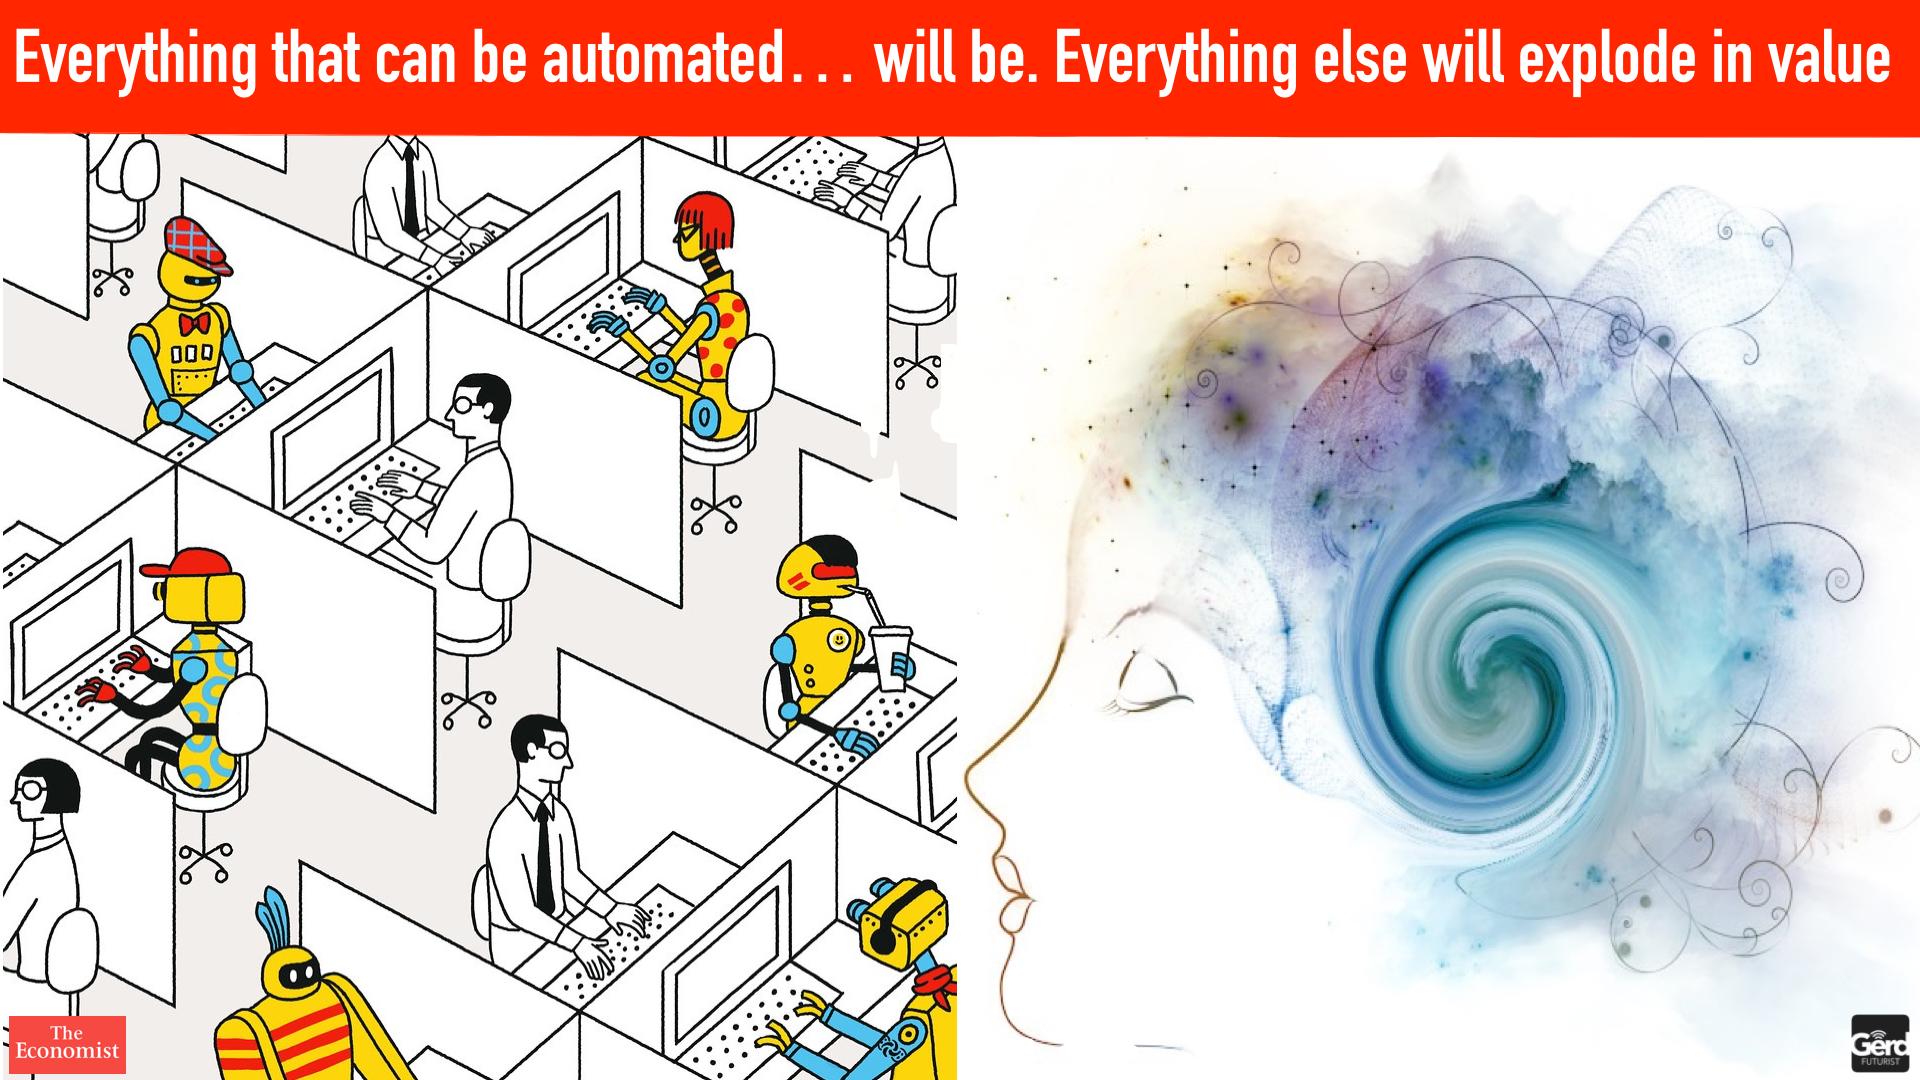 technology and humanity the future gerd leonhard futurist london public.021